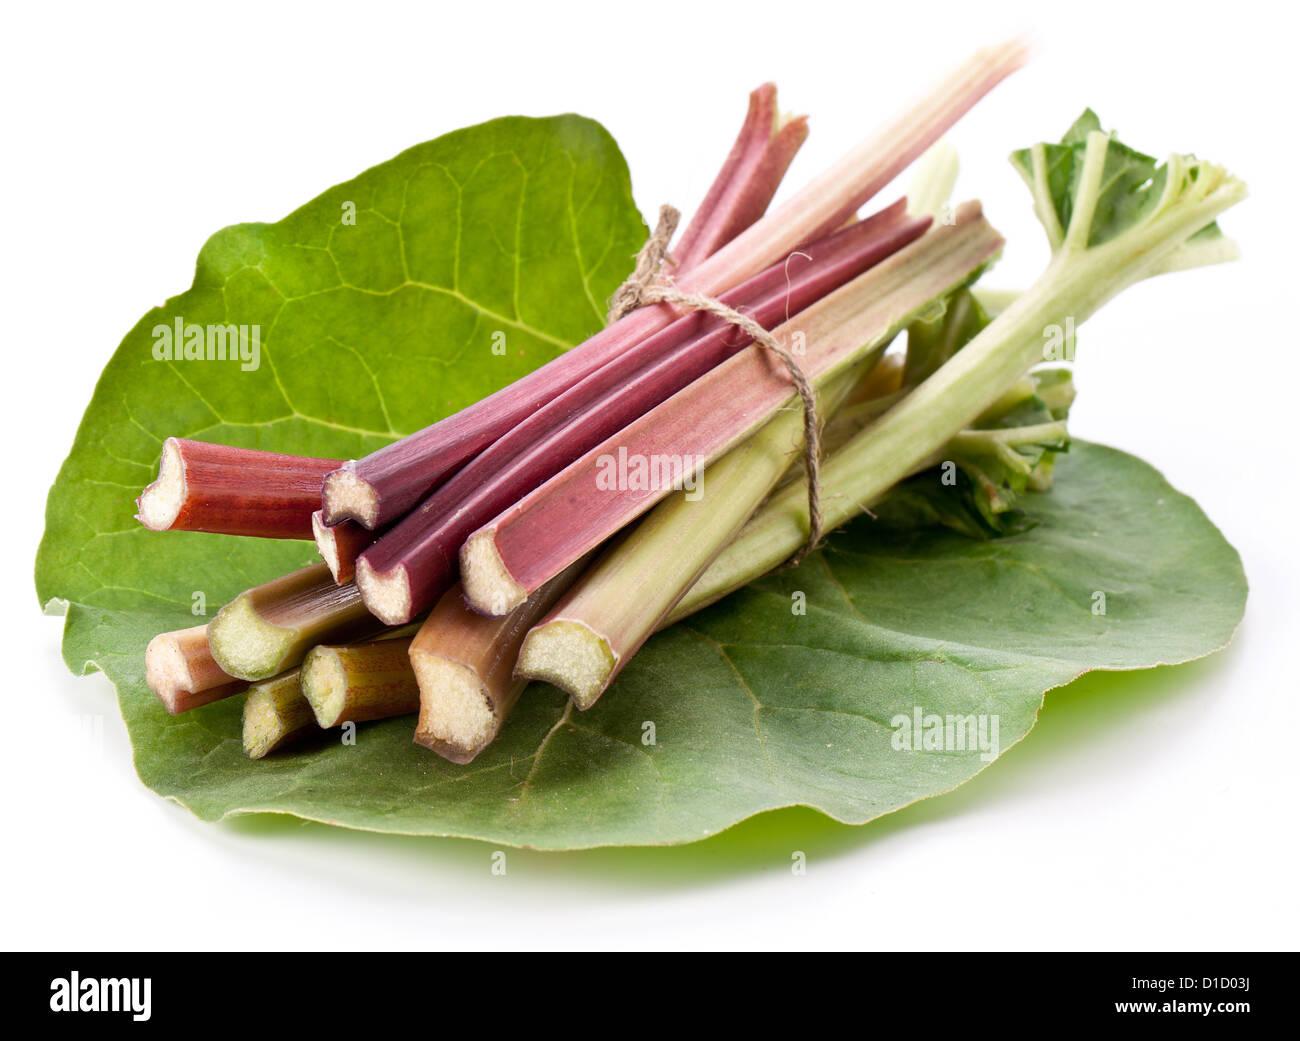 Rhubarb stalks on a white background. - Stock Image